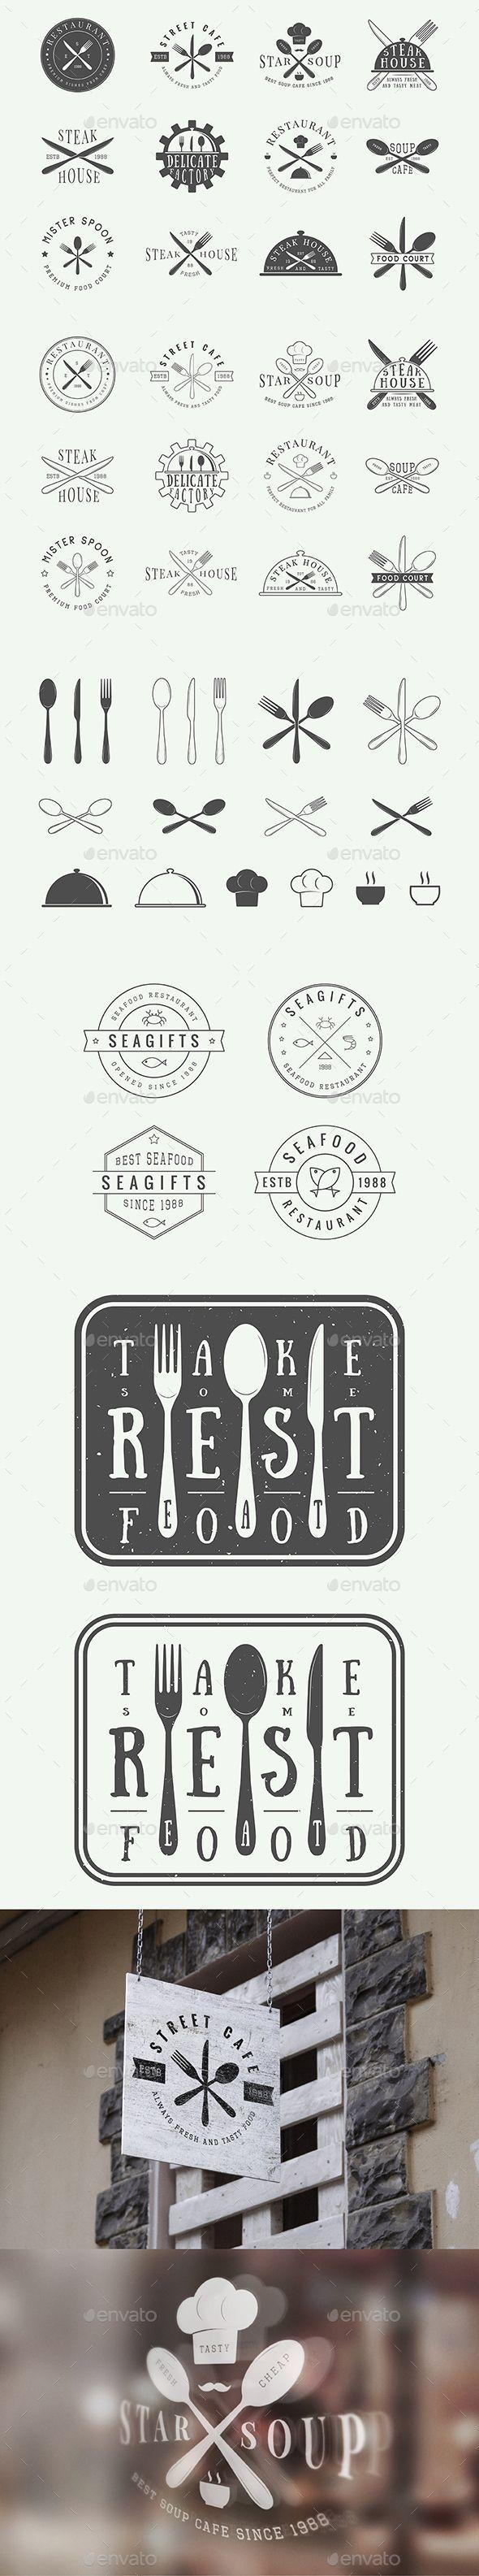 Vintage Restaurant Emblems Template PSD, Vector EPS, AI Illustrator